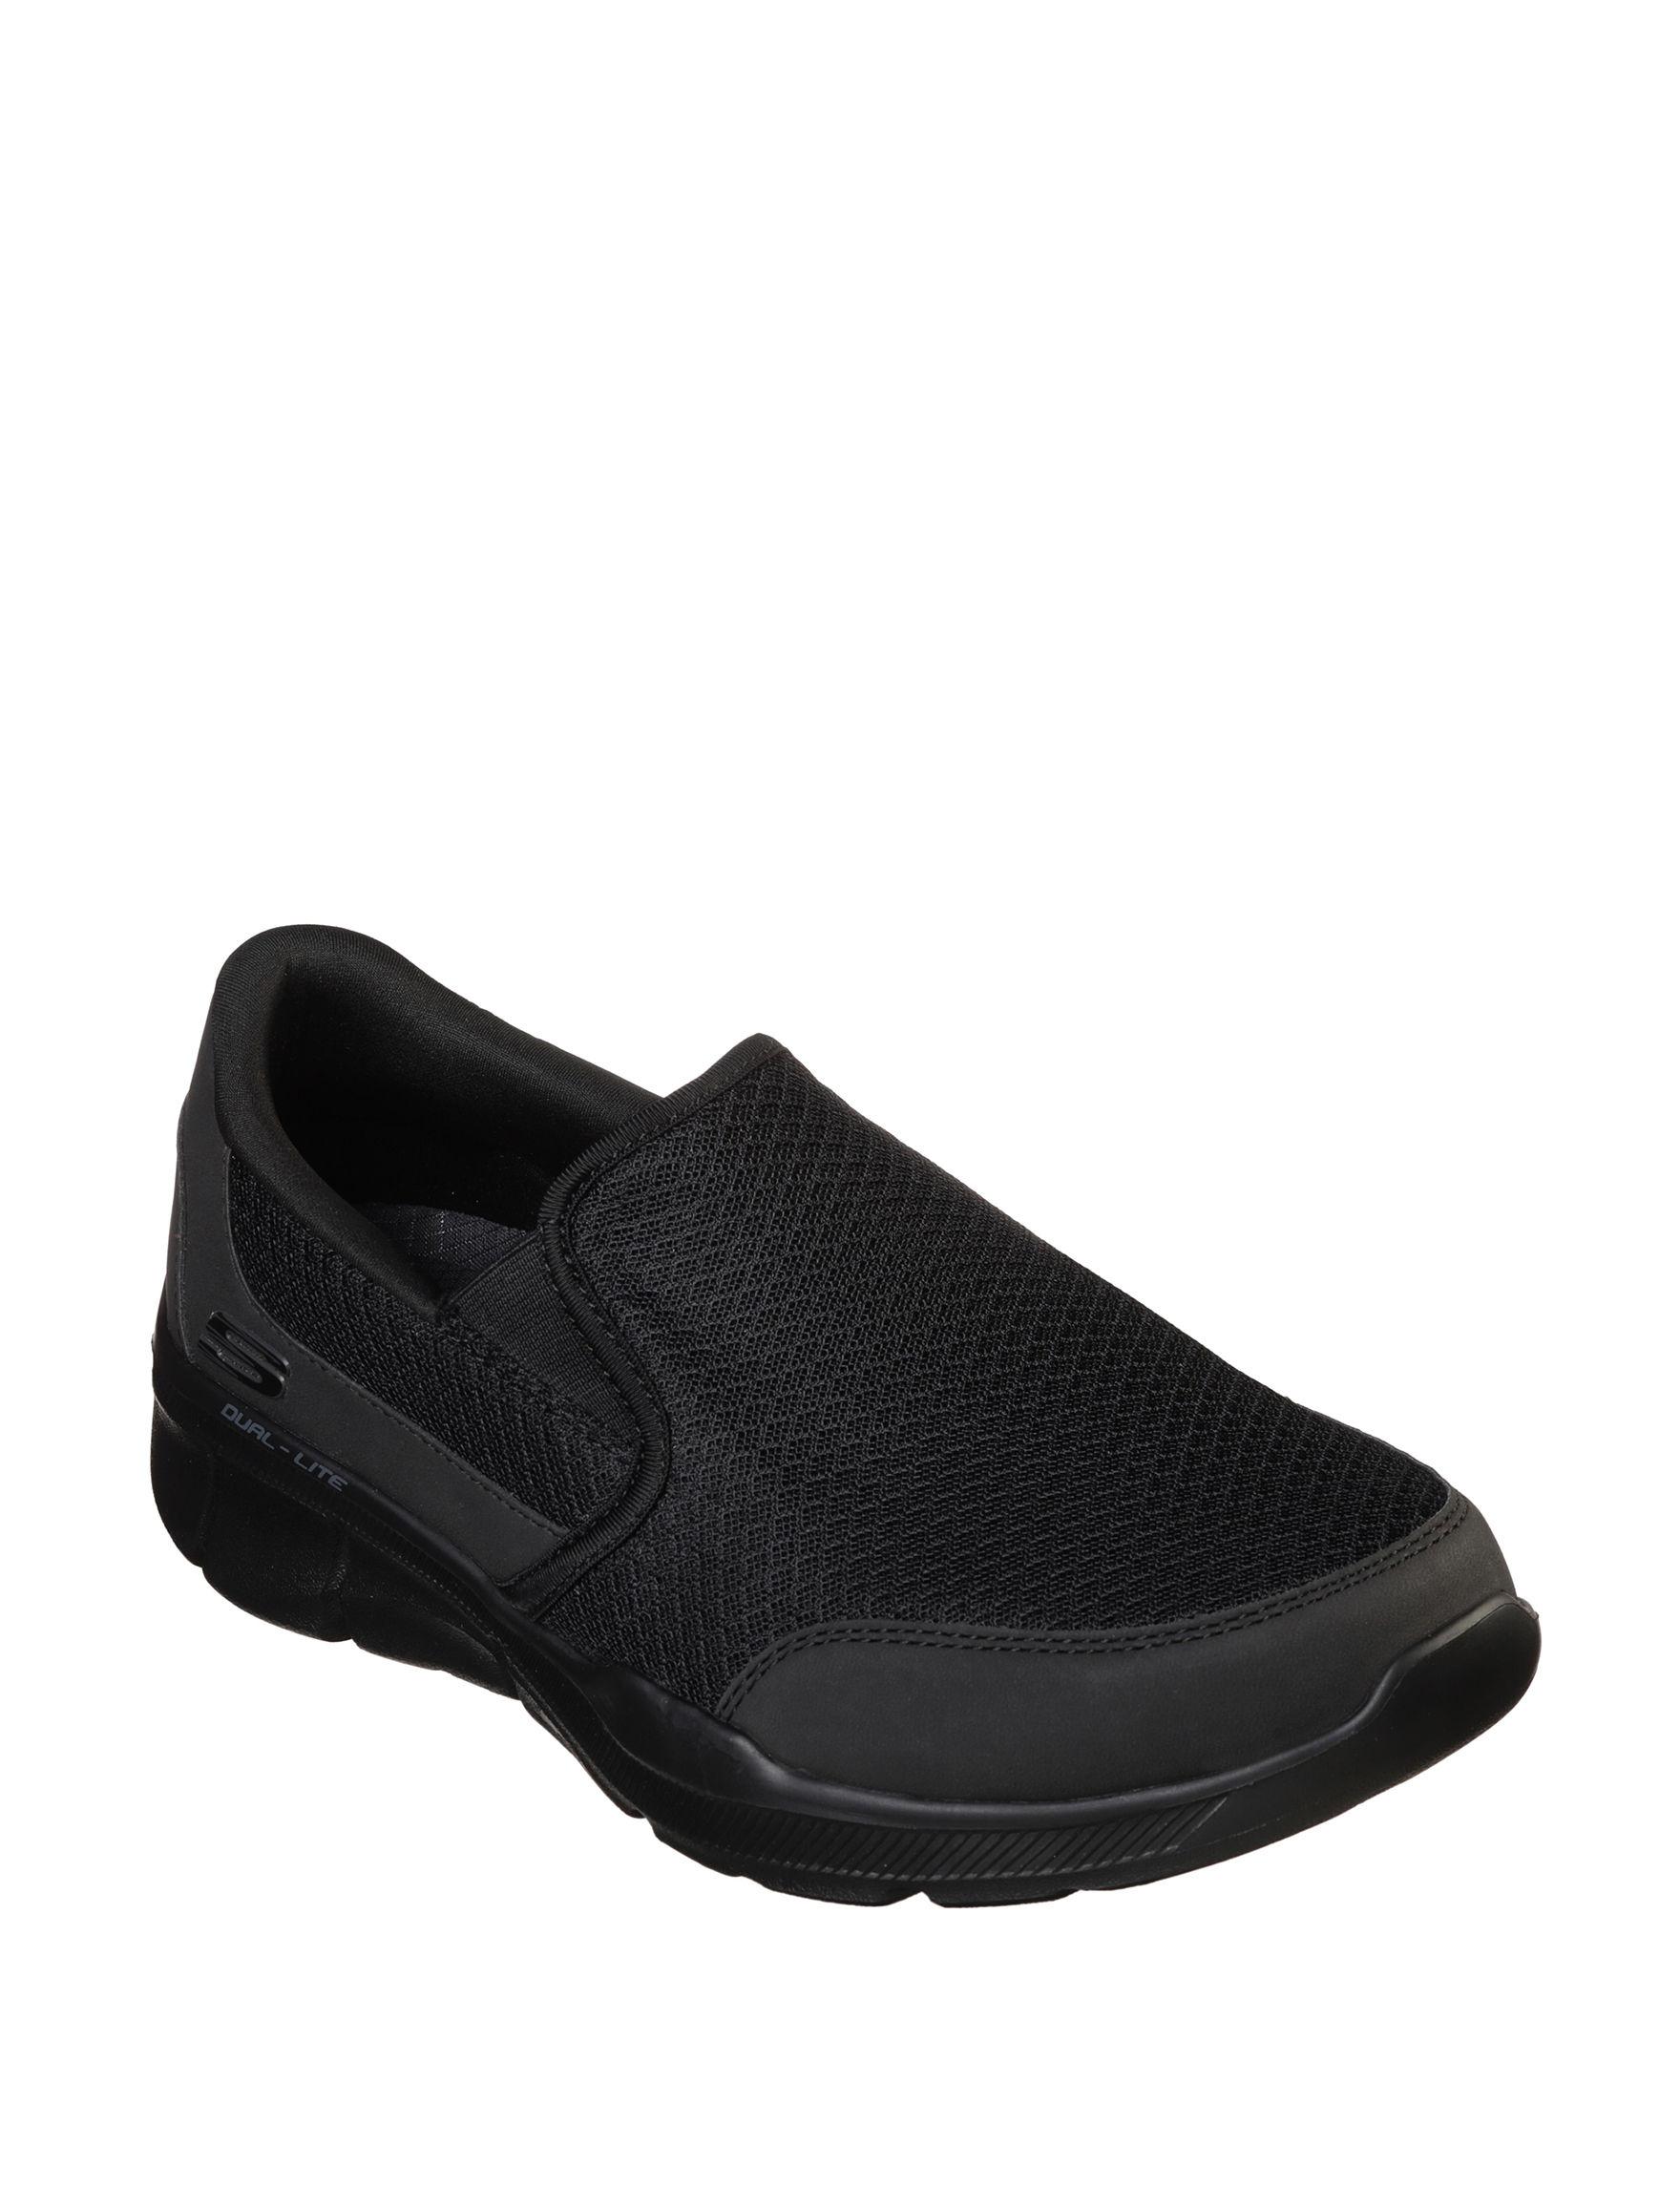 Skechers Black